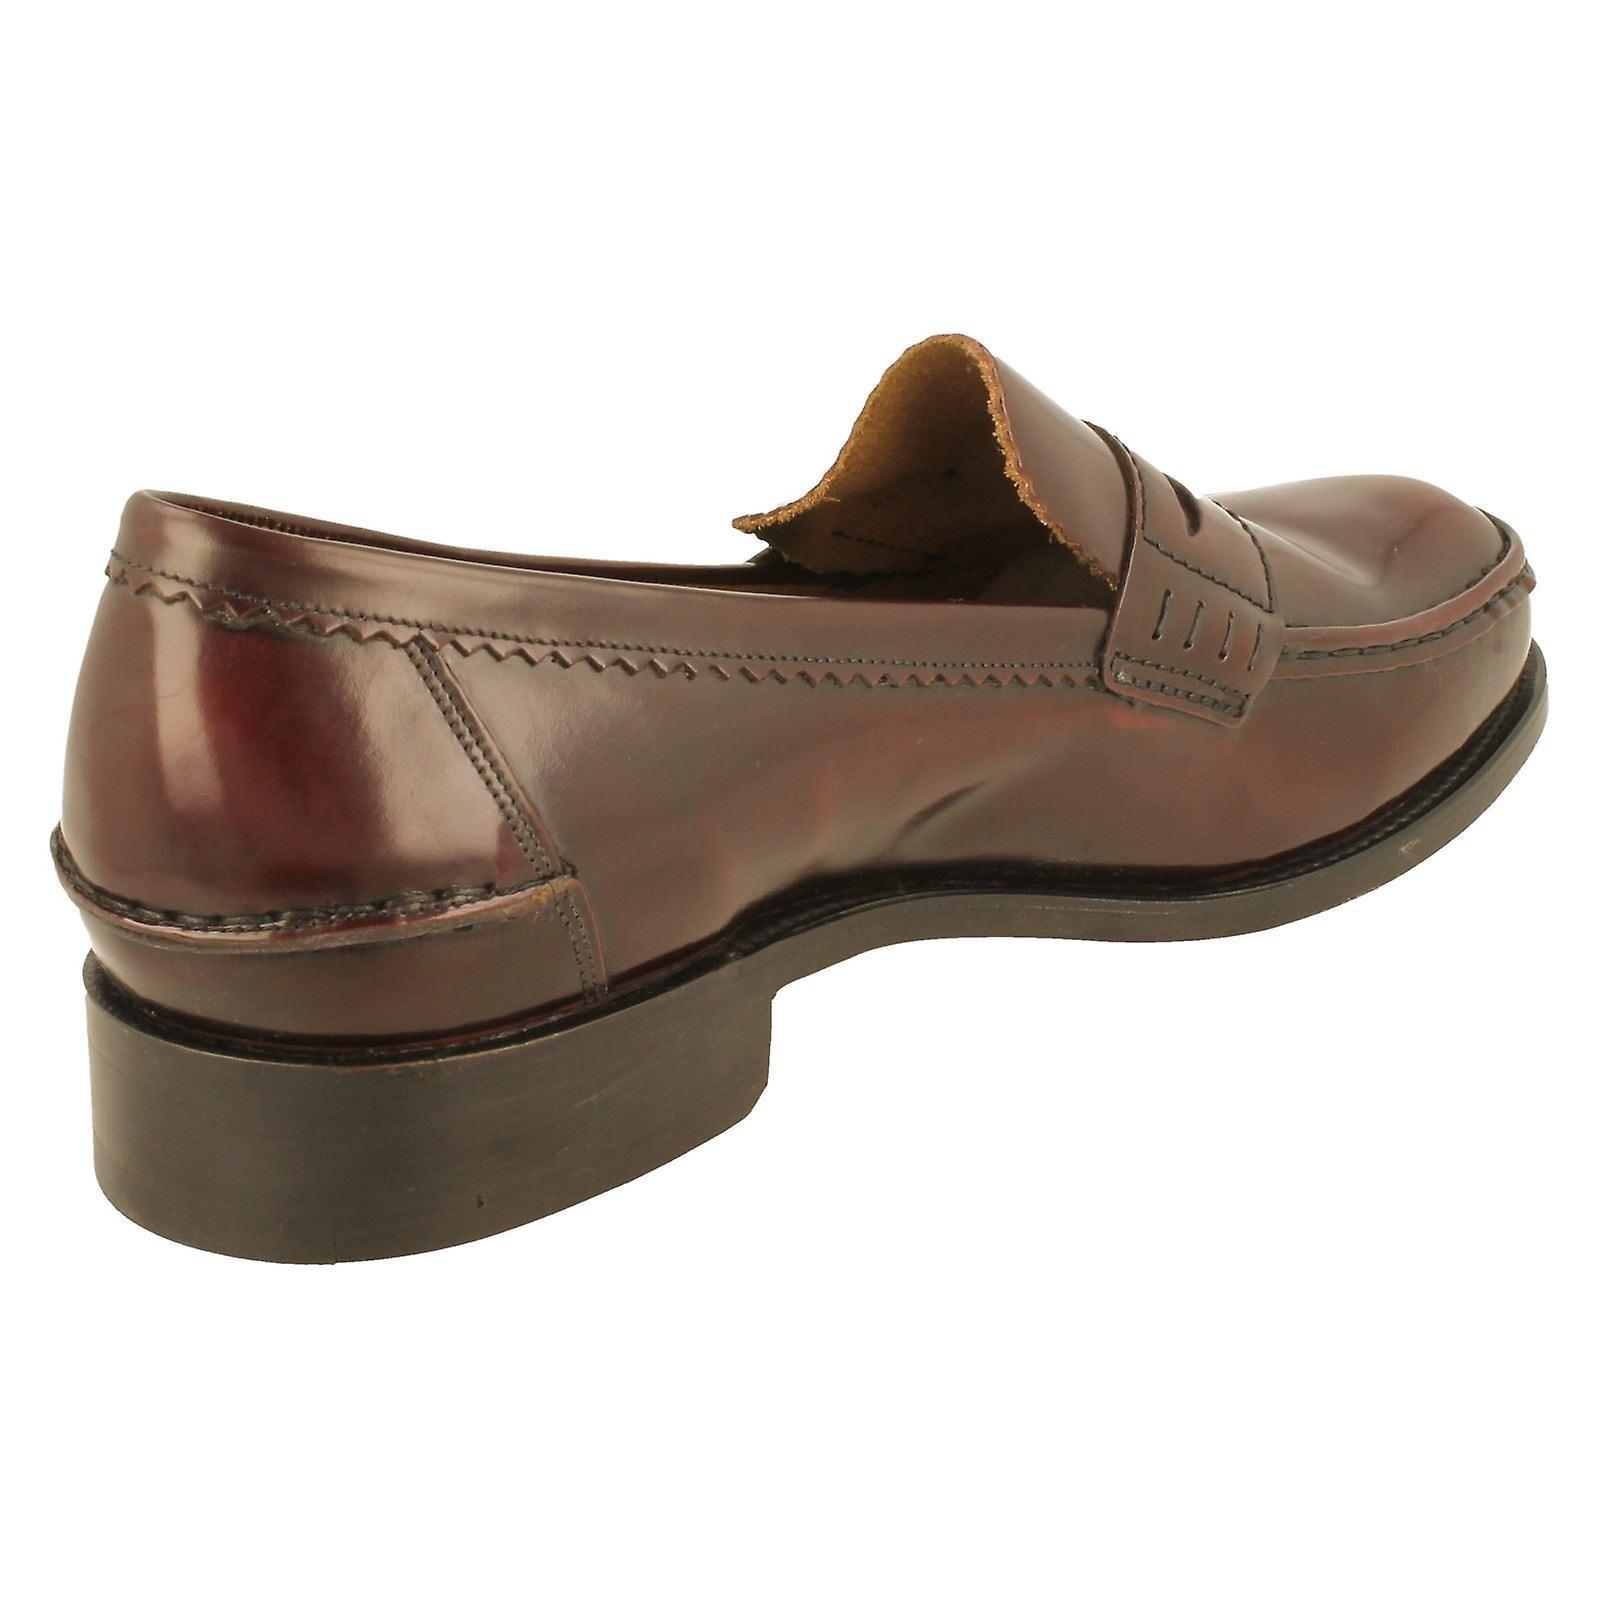 fc5a8888702 Mens Barker Loafers Caruso